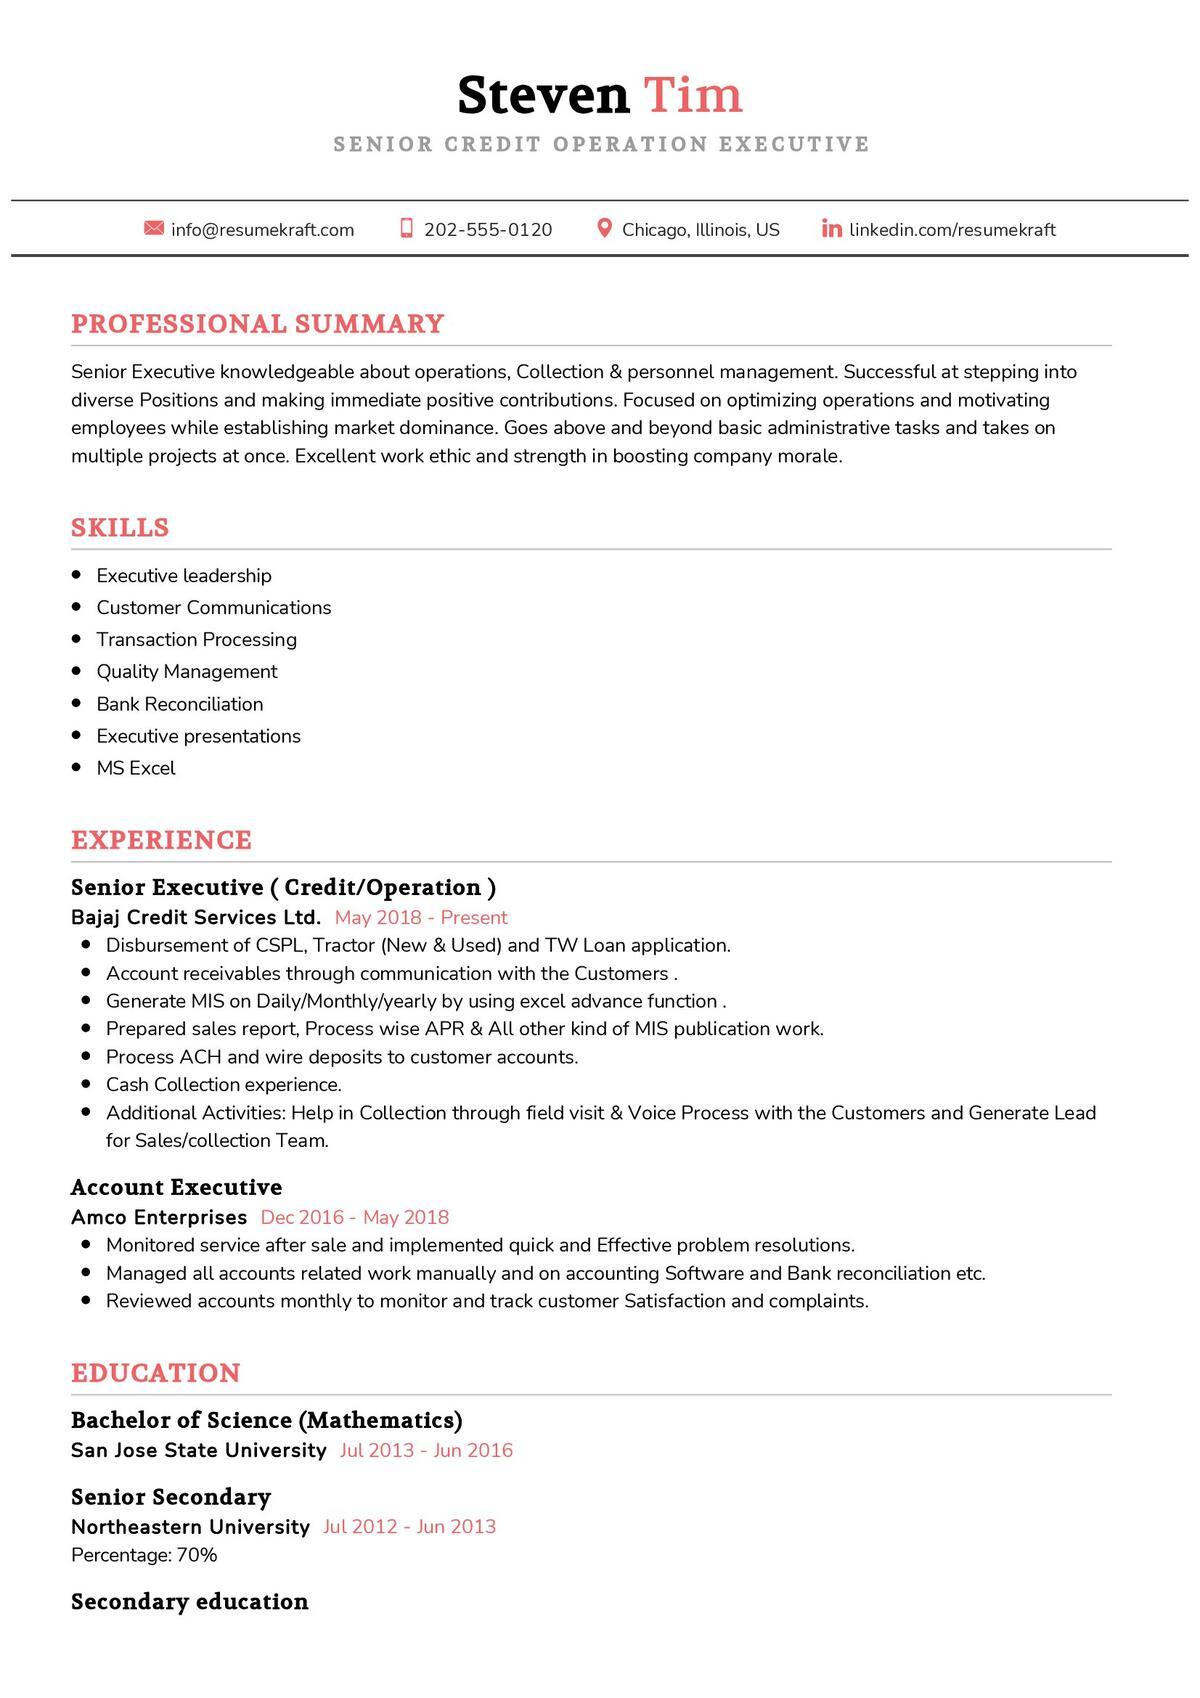 Credit Operation Executive CV Sample